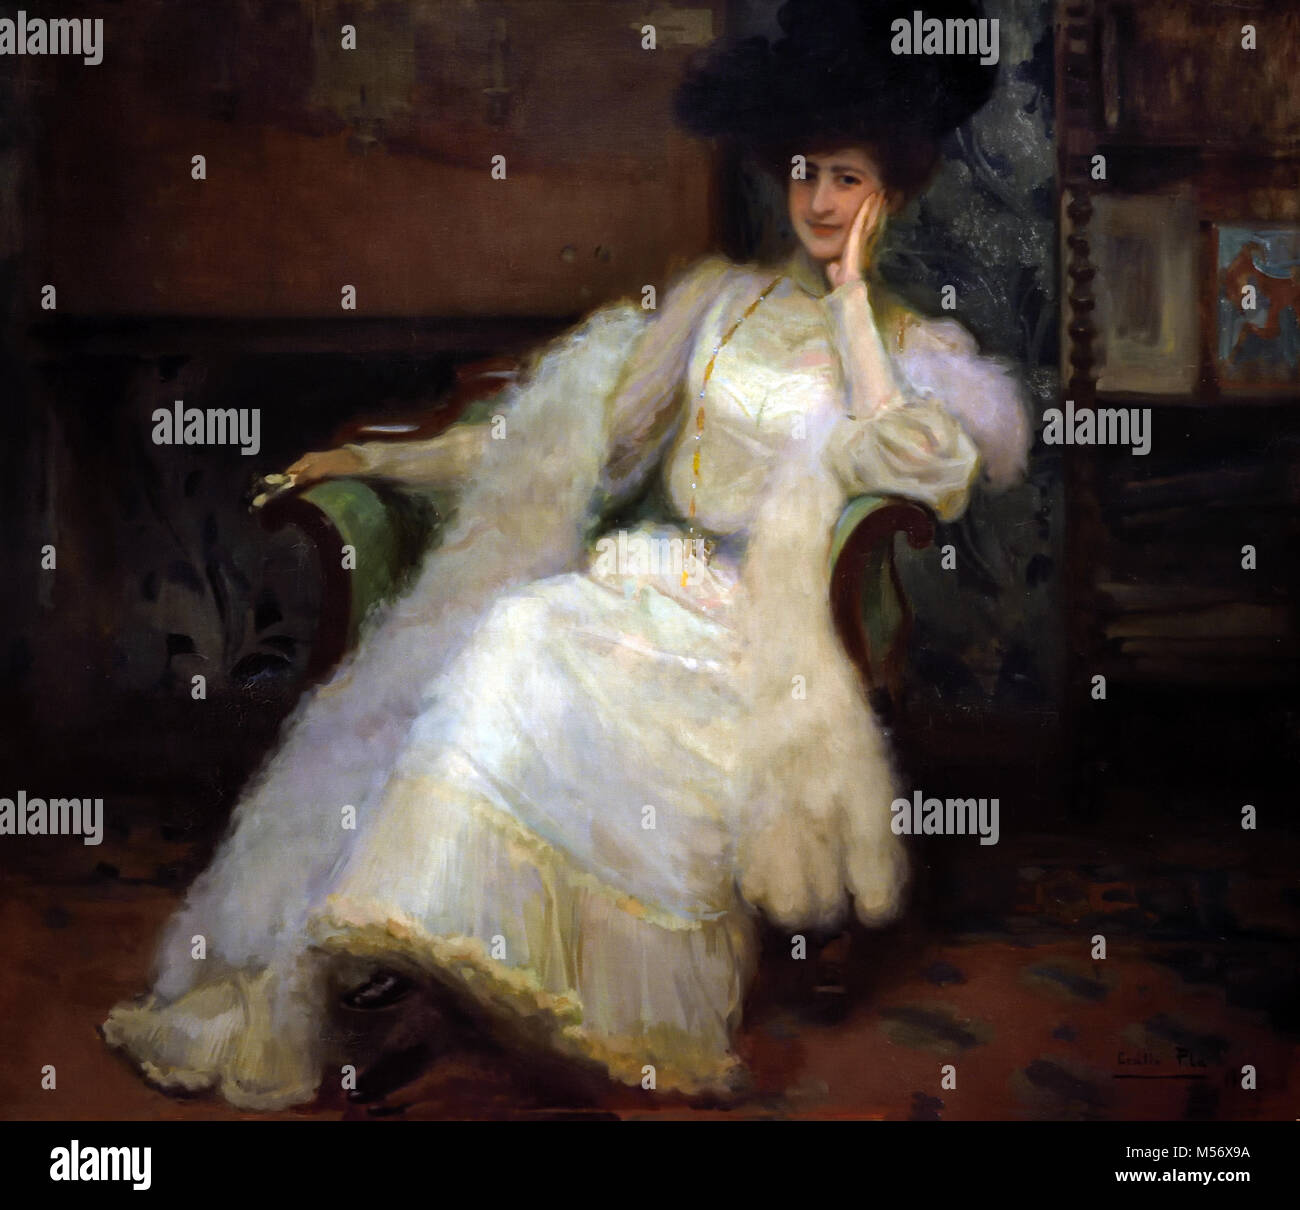 The Countess of Yumuri 1903, Cecilio Pla 1880-1934 20th, century, Spain, Spanish, - Stock Image